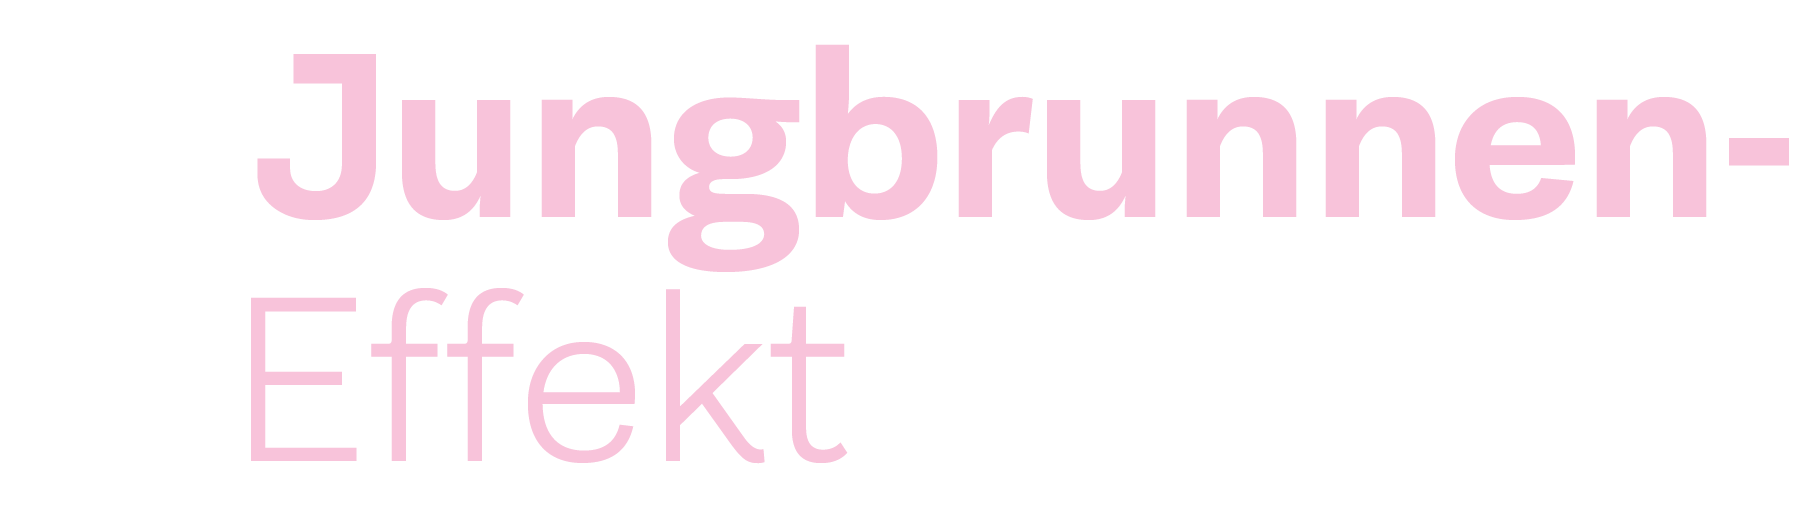 Jungbrunneneffekt